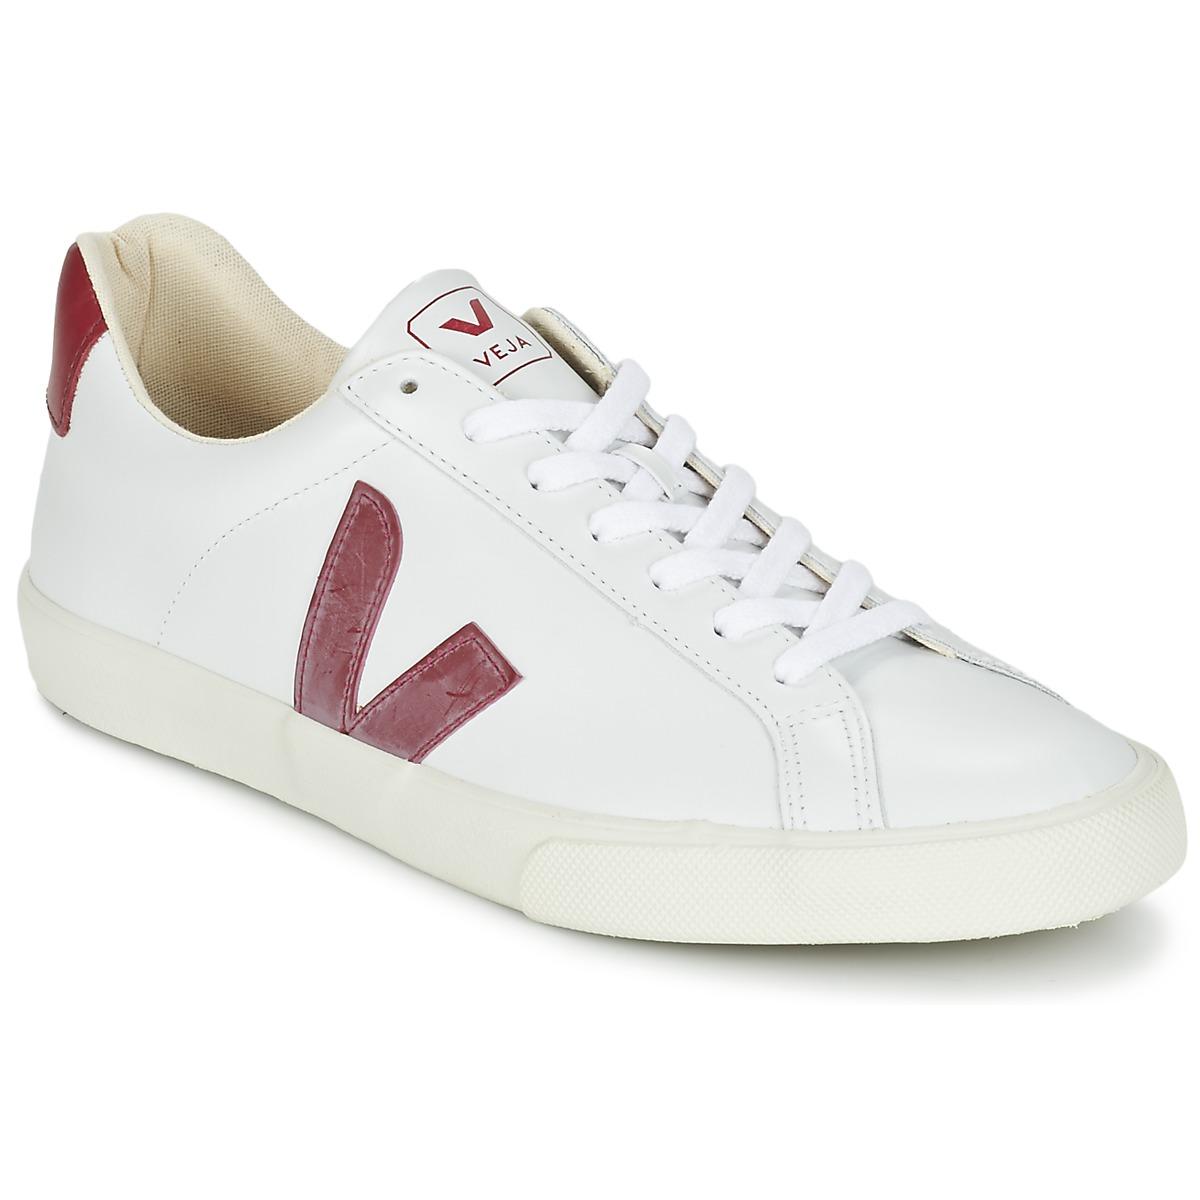 Veja ESPLAR Blanc / Rouge